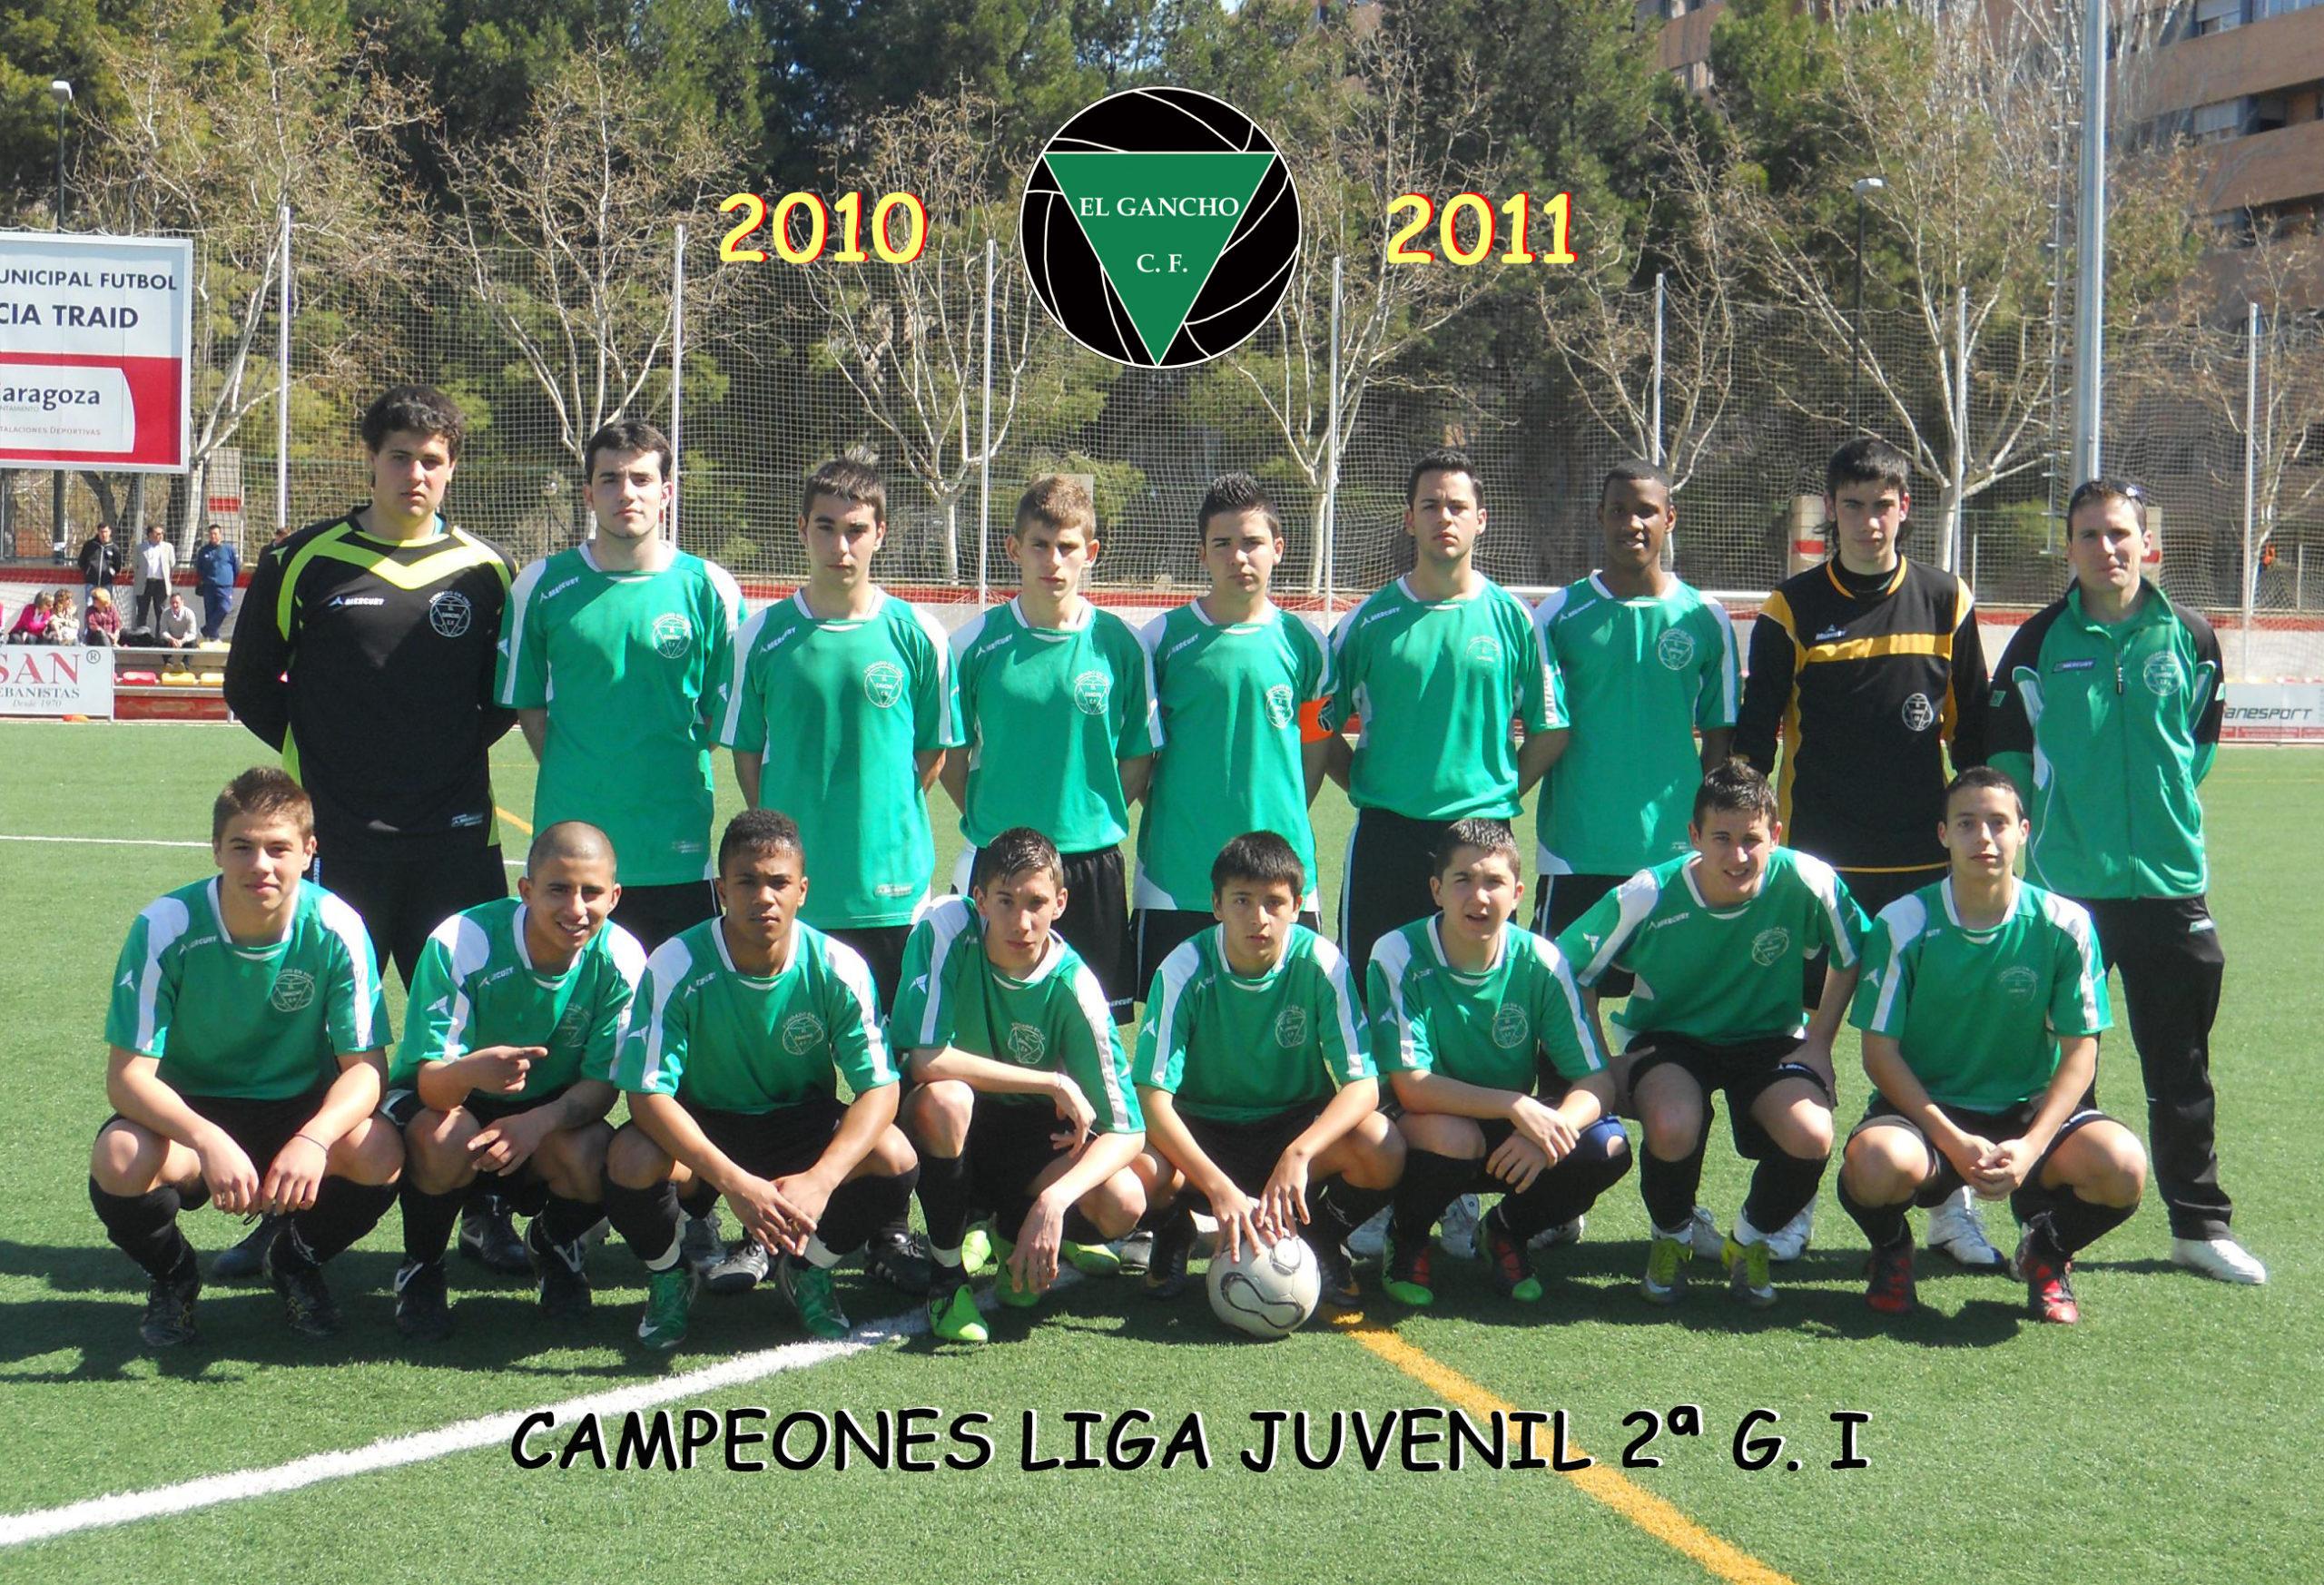 2010-2011 Juvenil